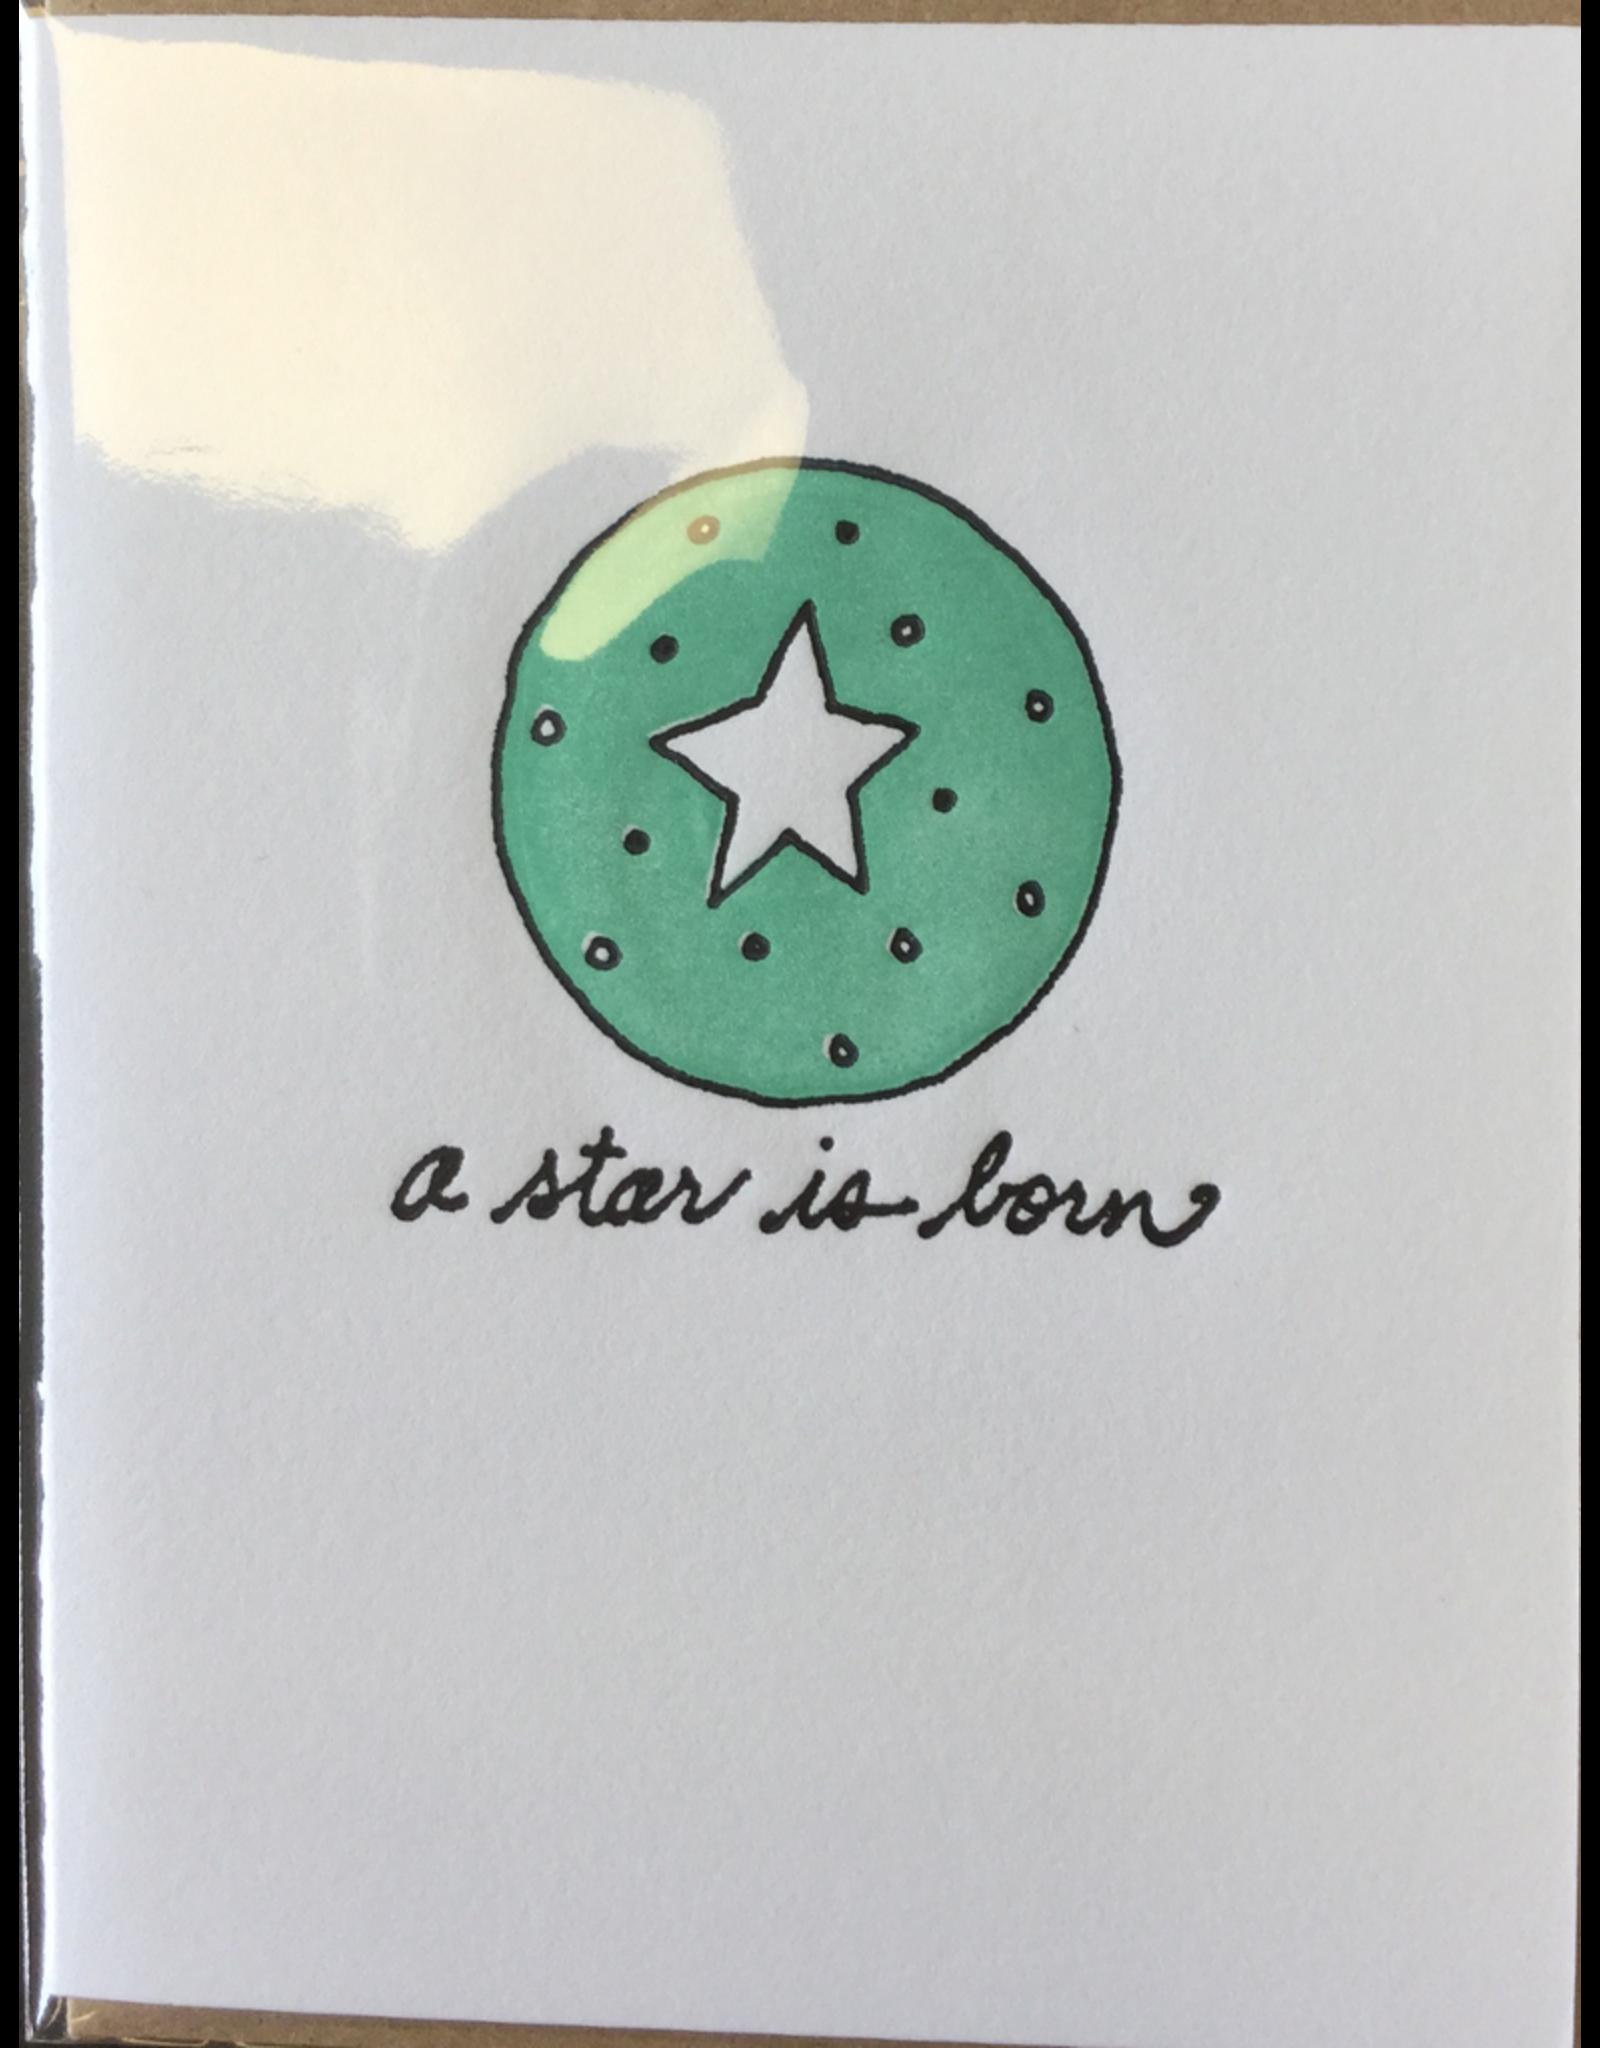 Karen Fuhr A star is born card, by Art Rocks Press